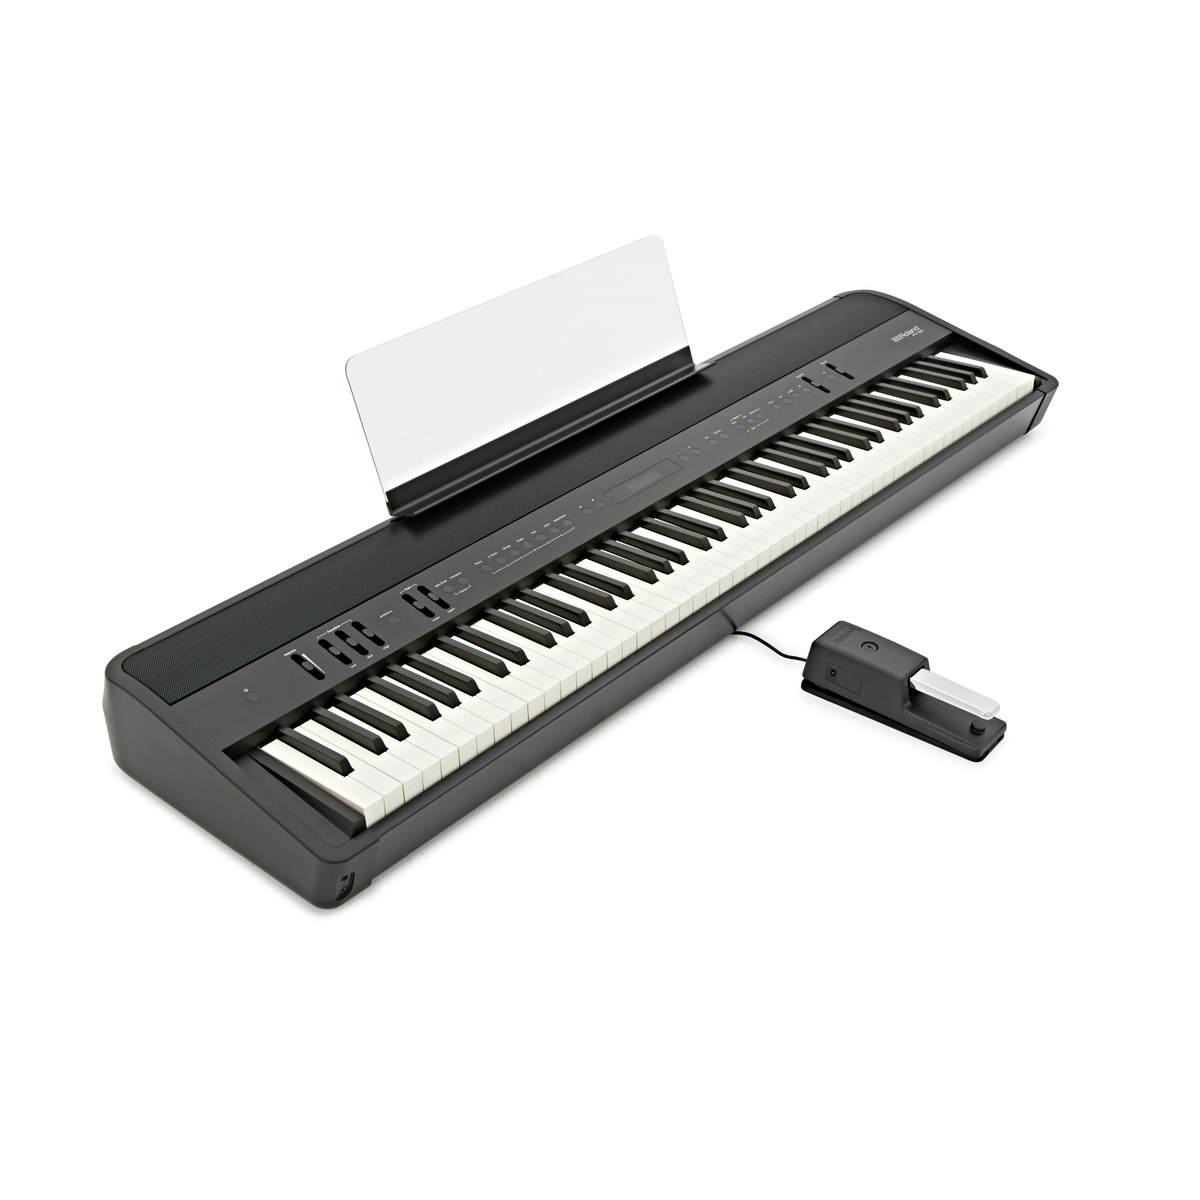 Digital Piano Roland Fp 2 : roland fp 90 digital piano black at gear4music ~ Vivirlamusica.com Haus und Dekorationen